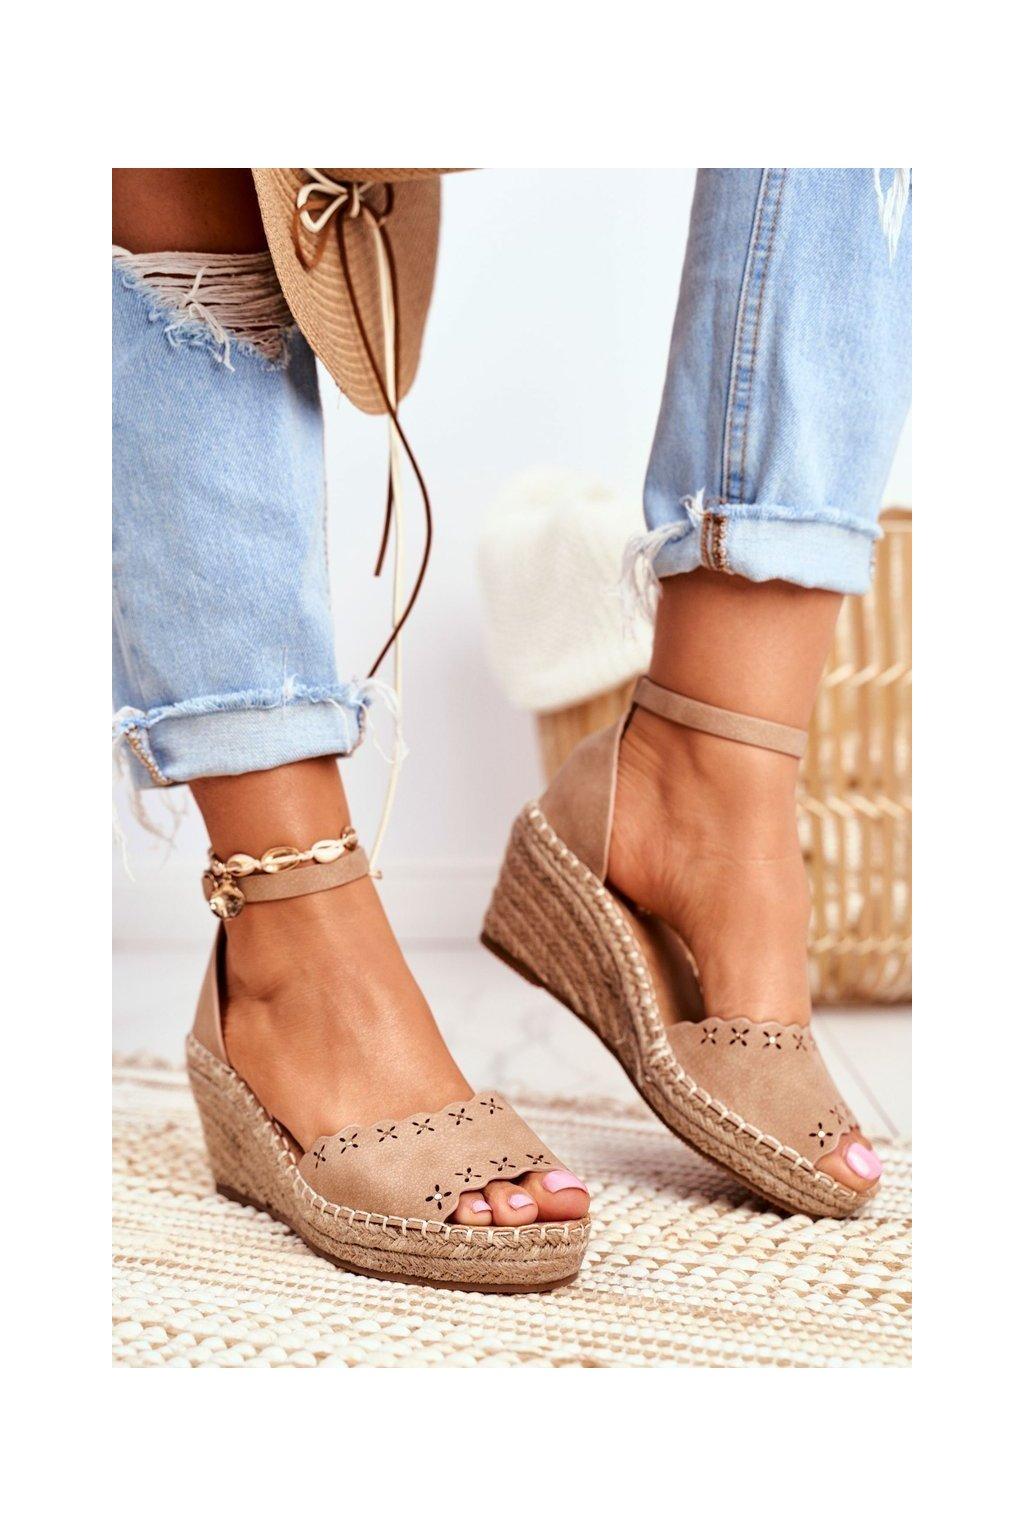 Hnedé sandále NJSK 9SD98-0953 BEIGE